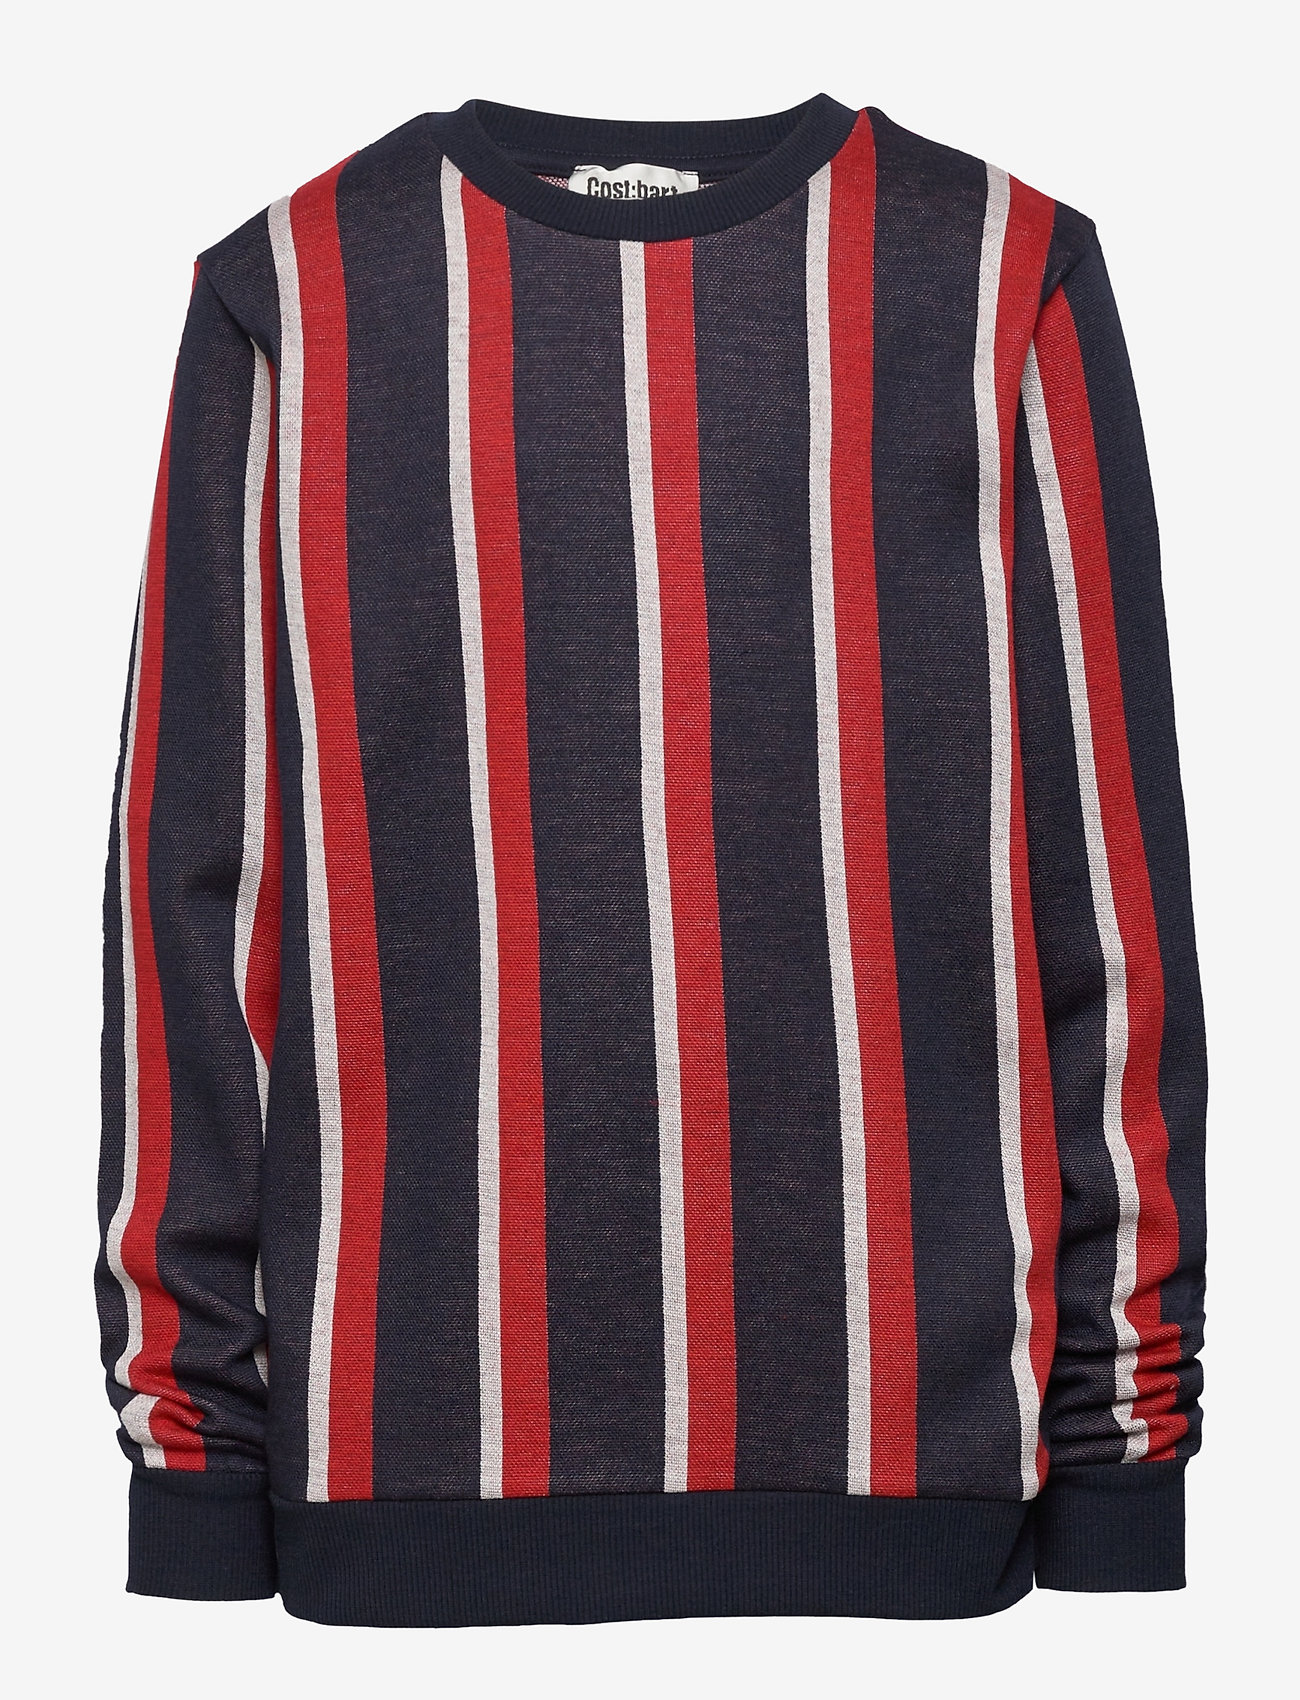 Costbart - HUDSON L_S SWEATR STRRINPED - sweat-shirt - black iris stripe aop - 0